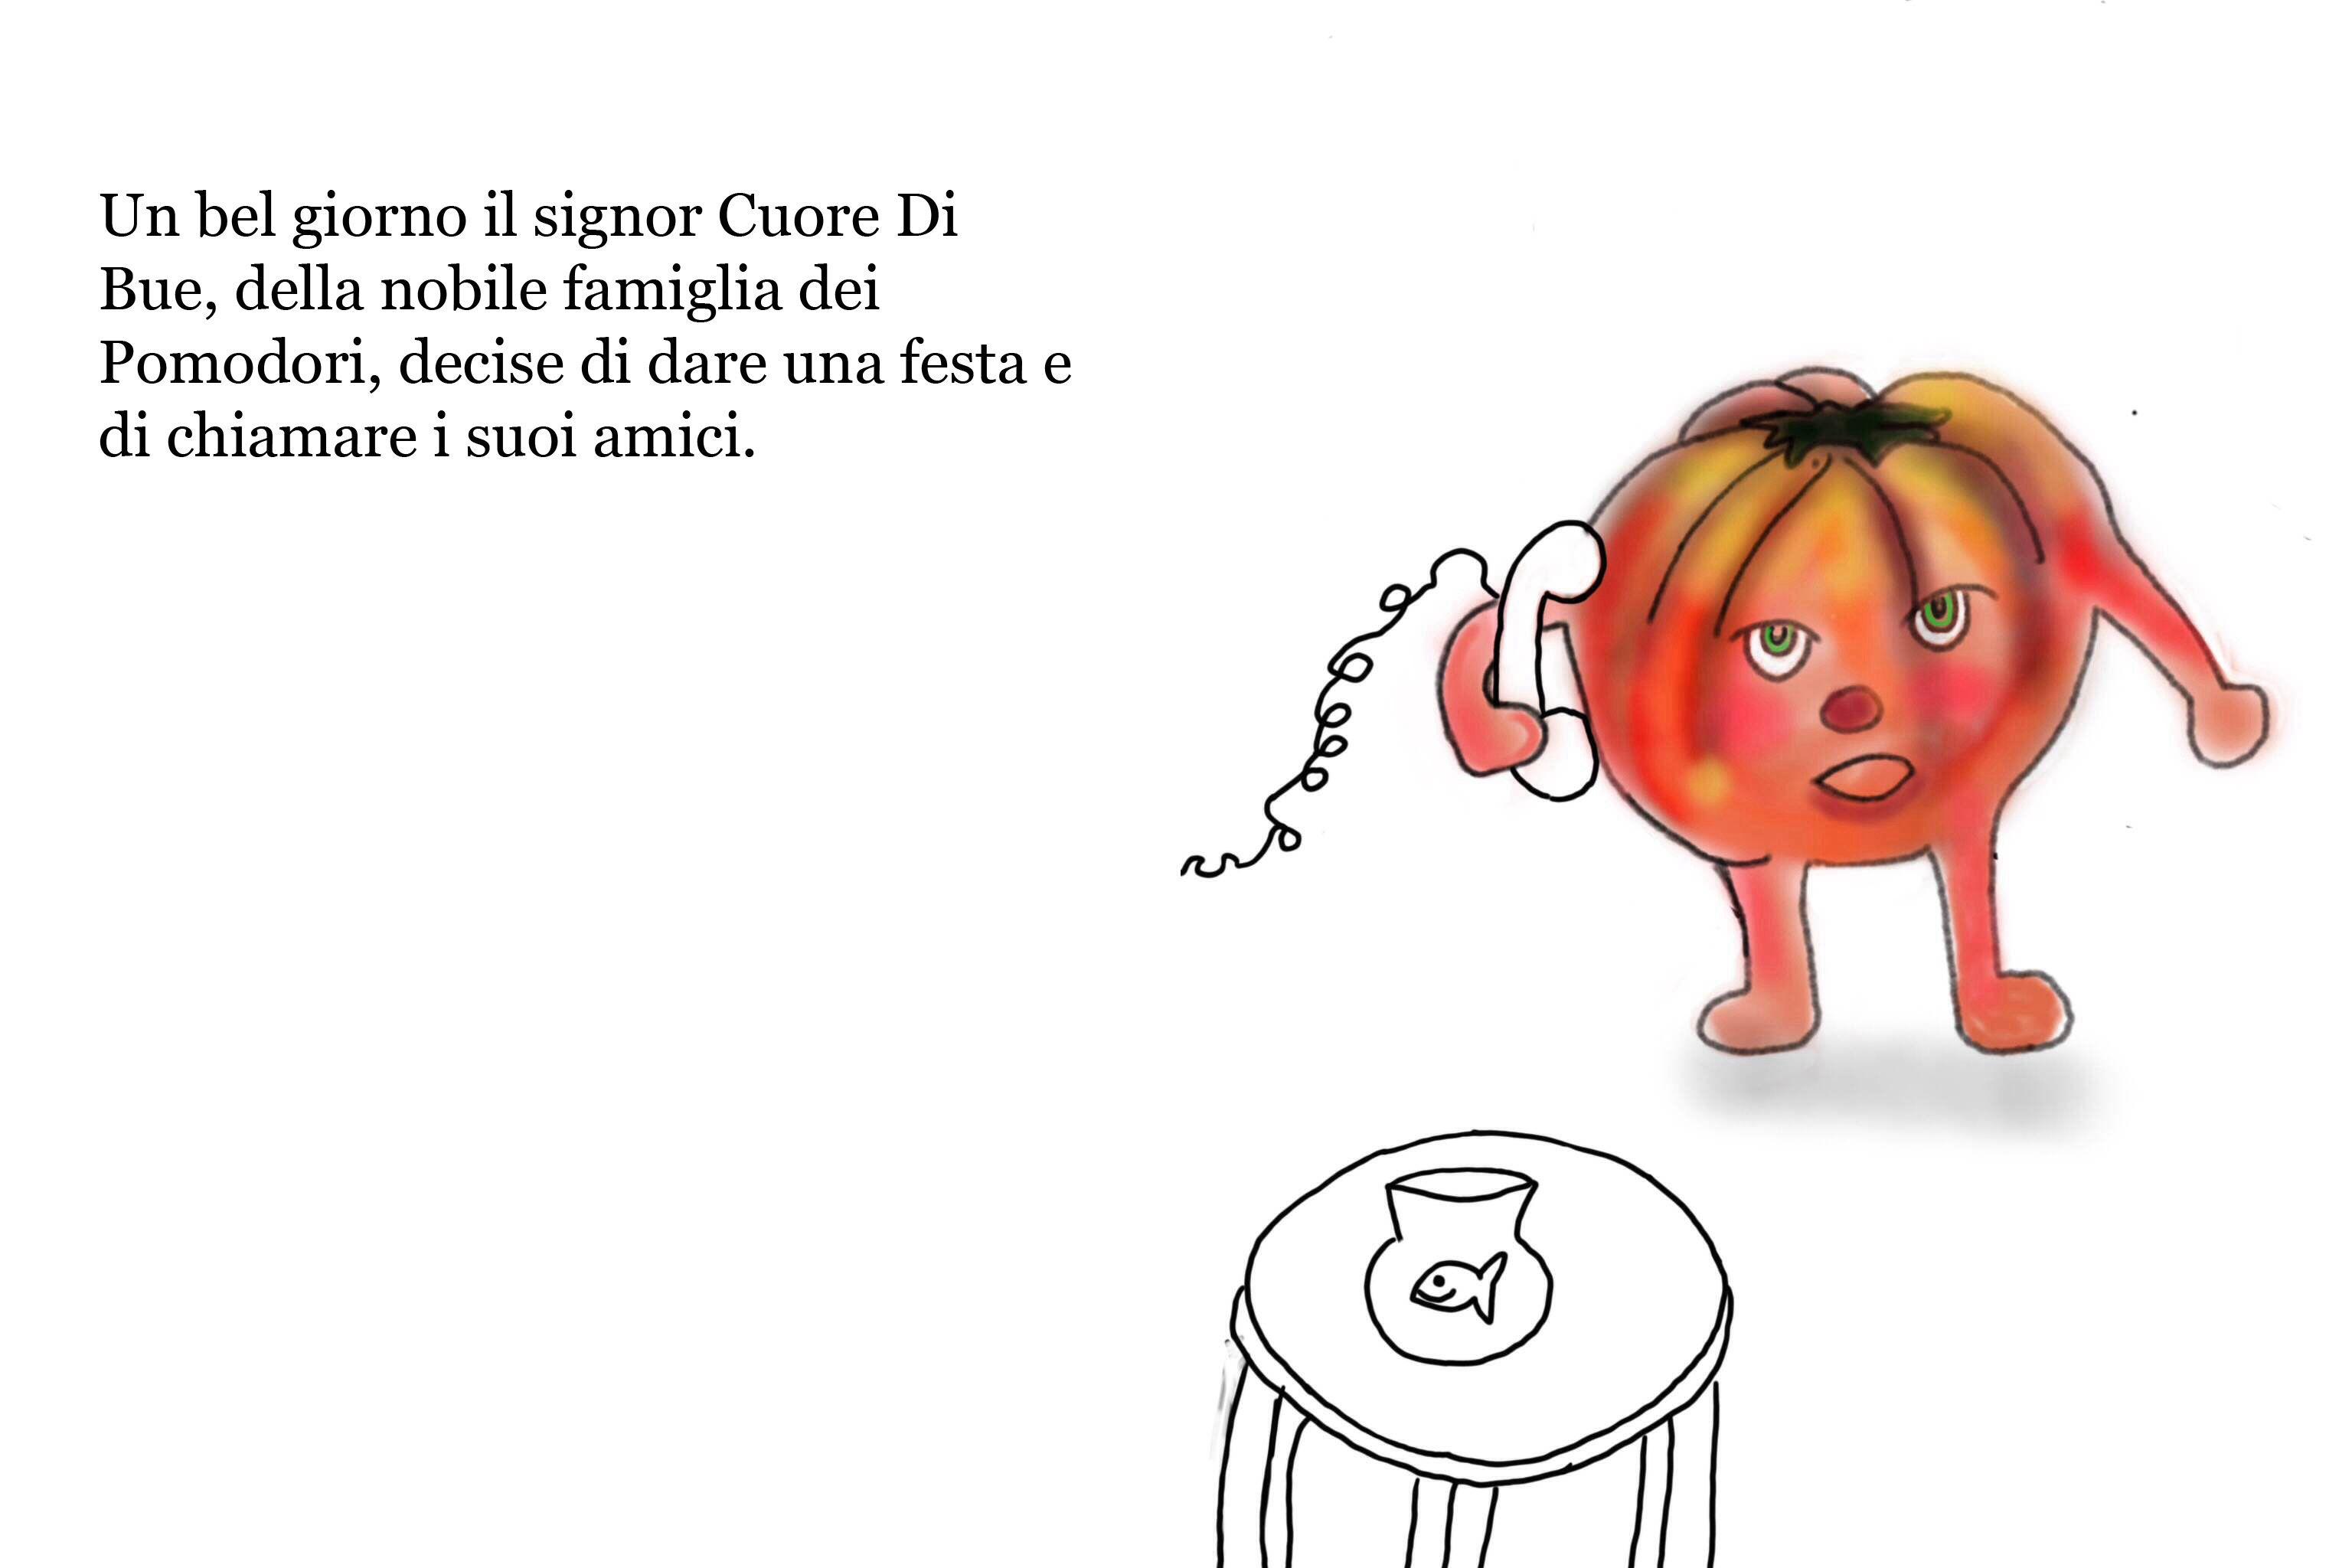 http://illustrazioniperbambini.blogspot.it/2014/08/insalata-fredda.html